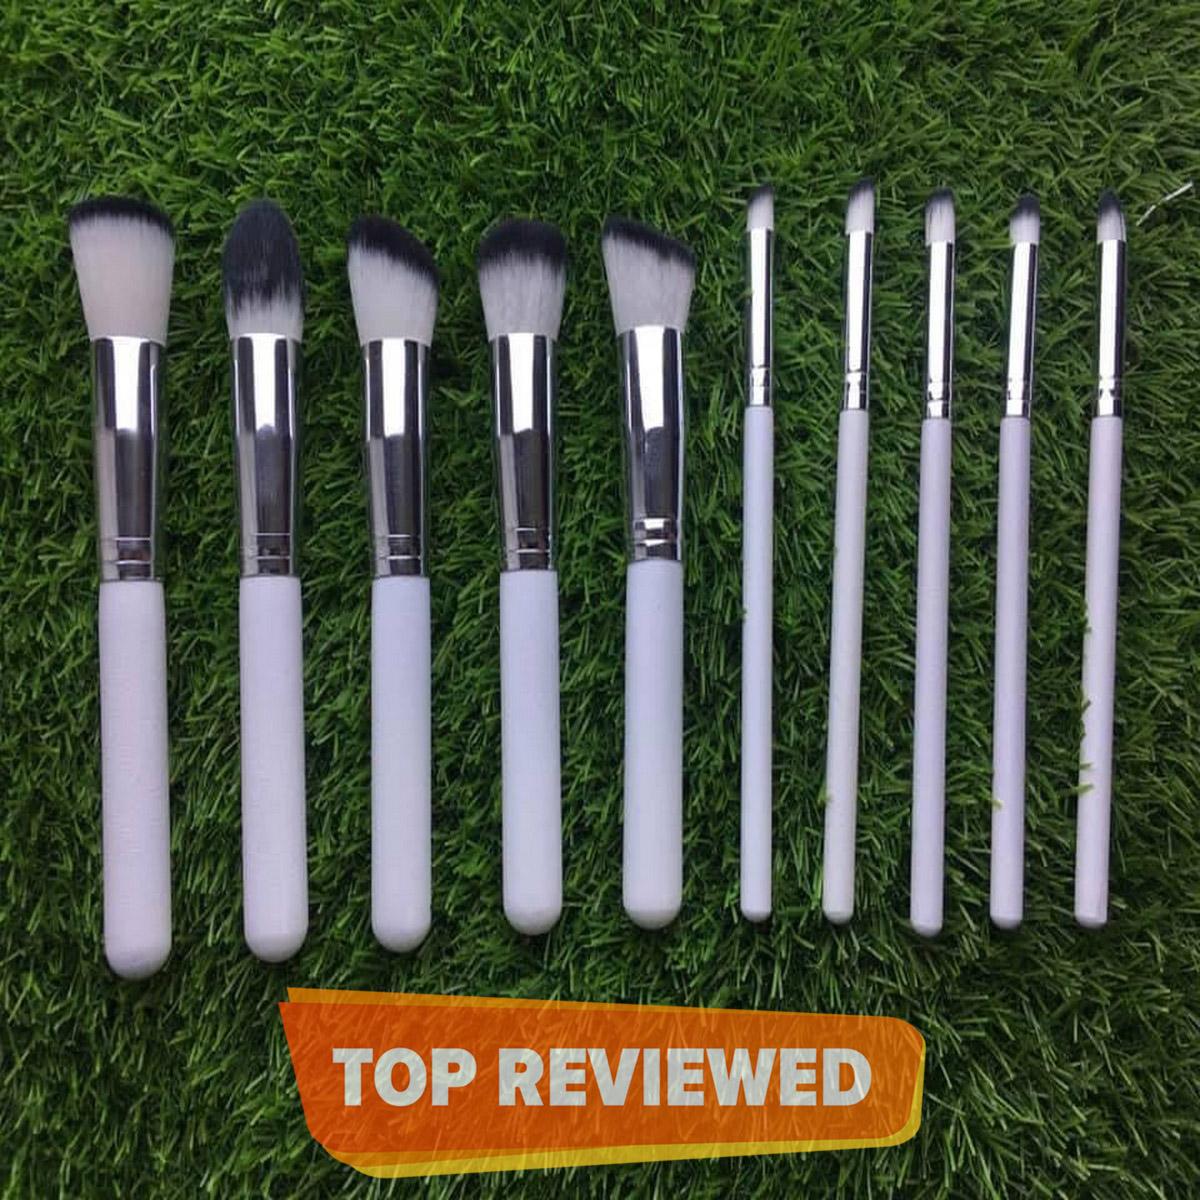 Best Make up brush set of 10 imported product.